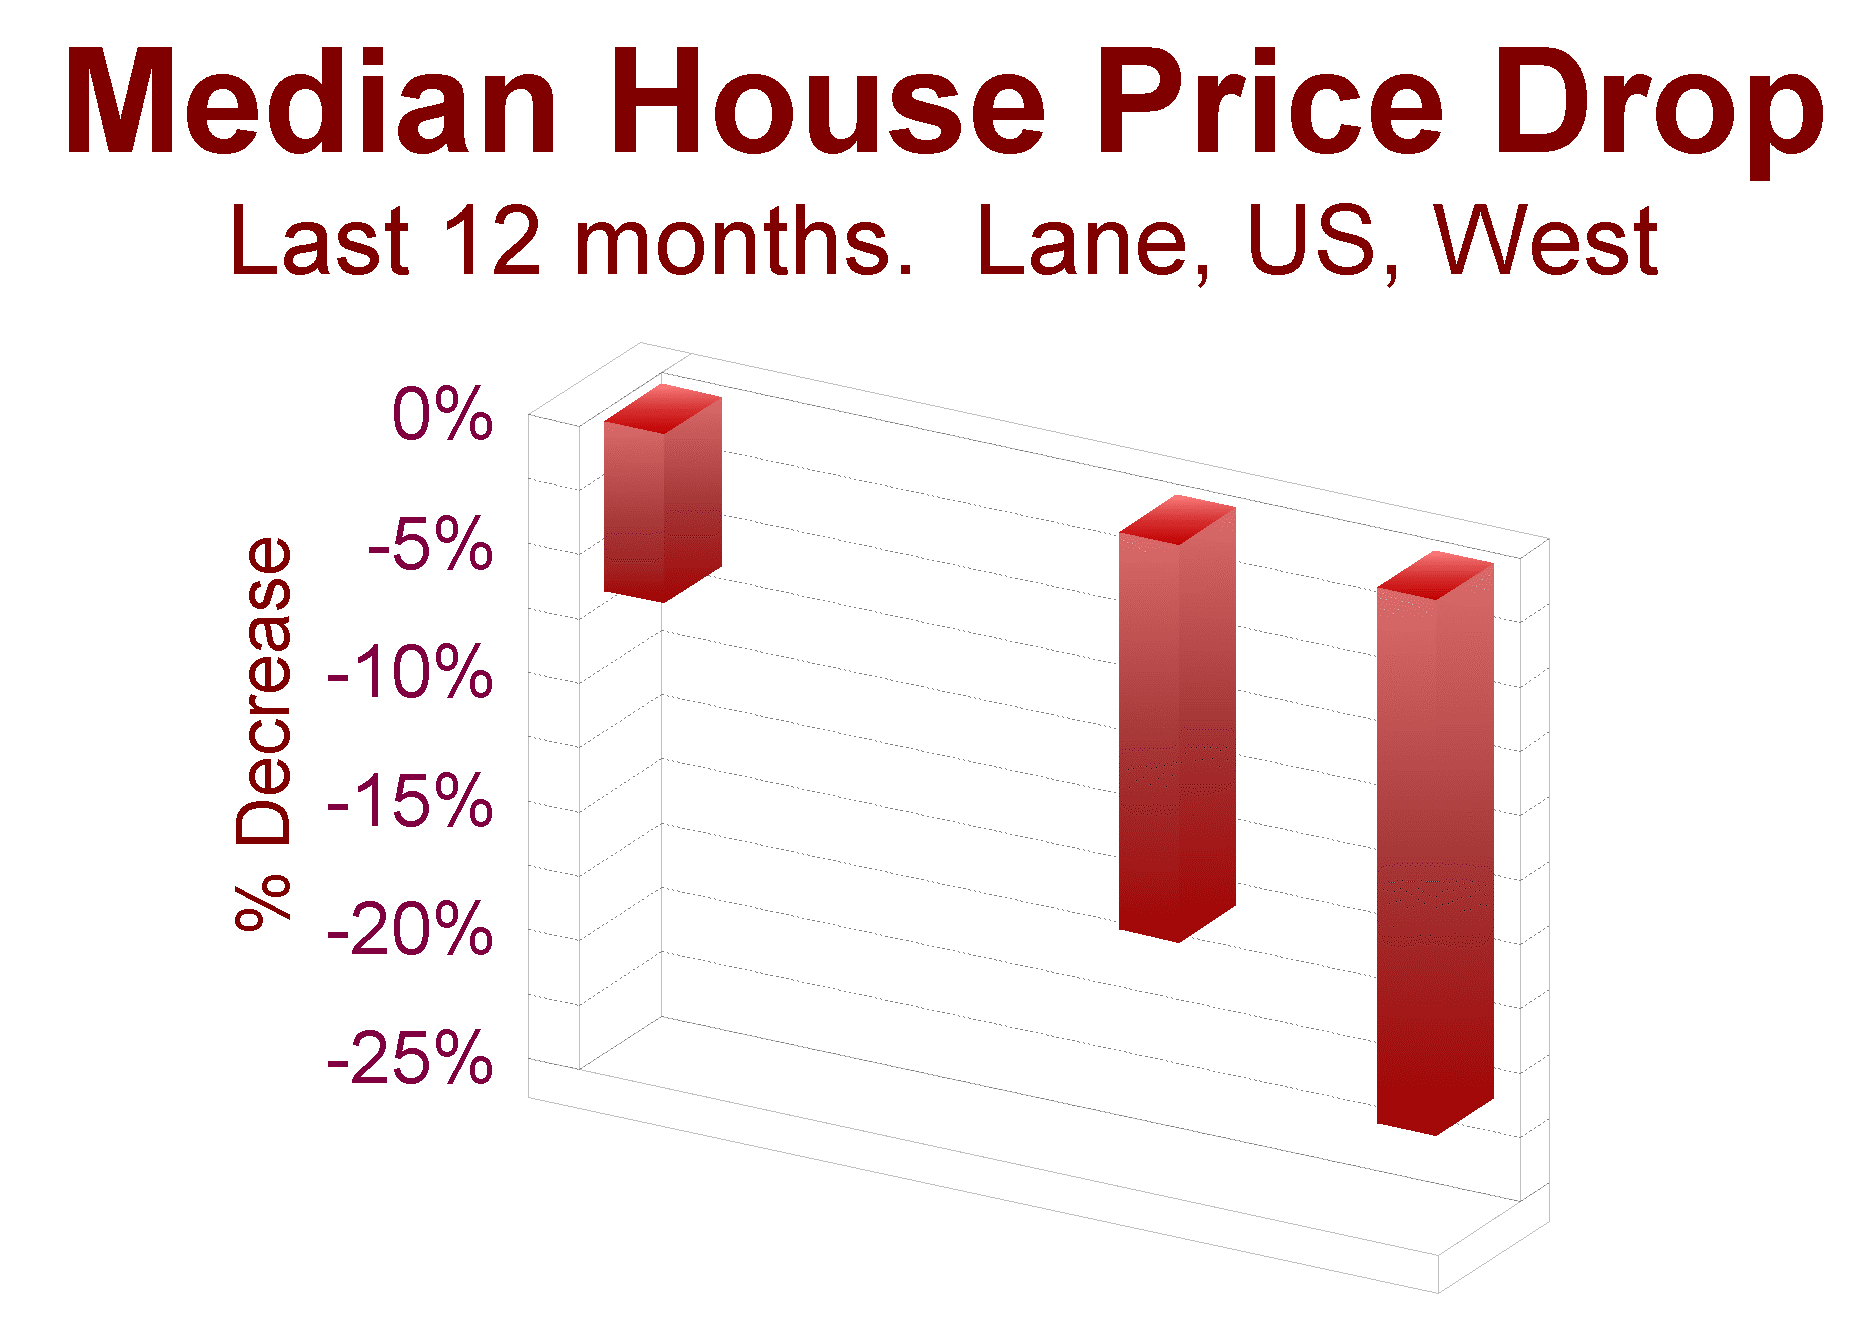 median-price-drop, last 12 months